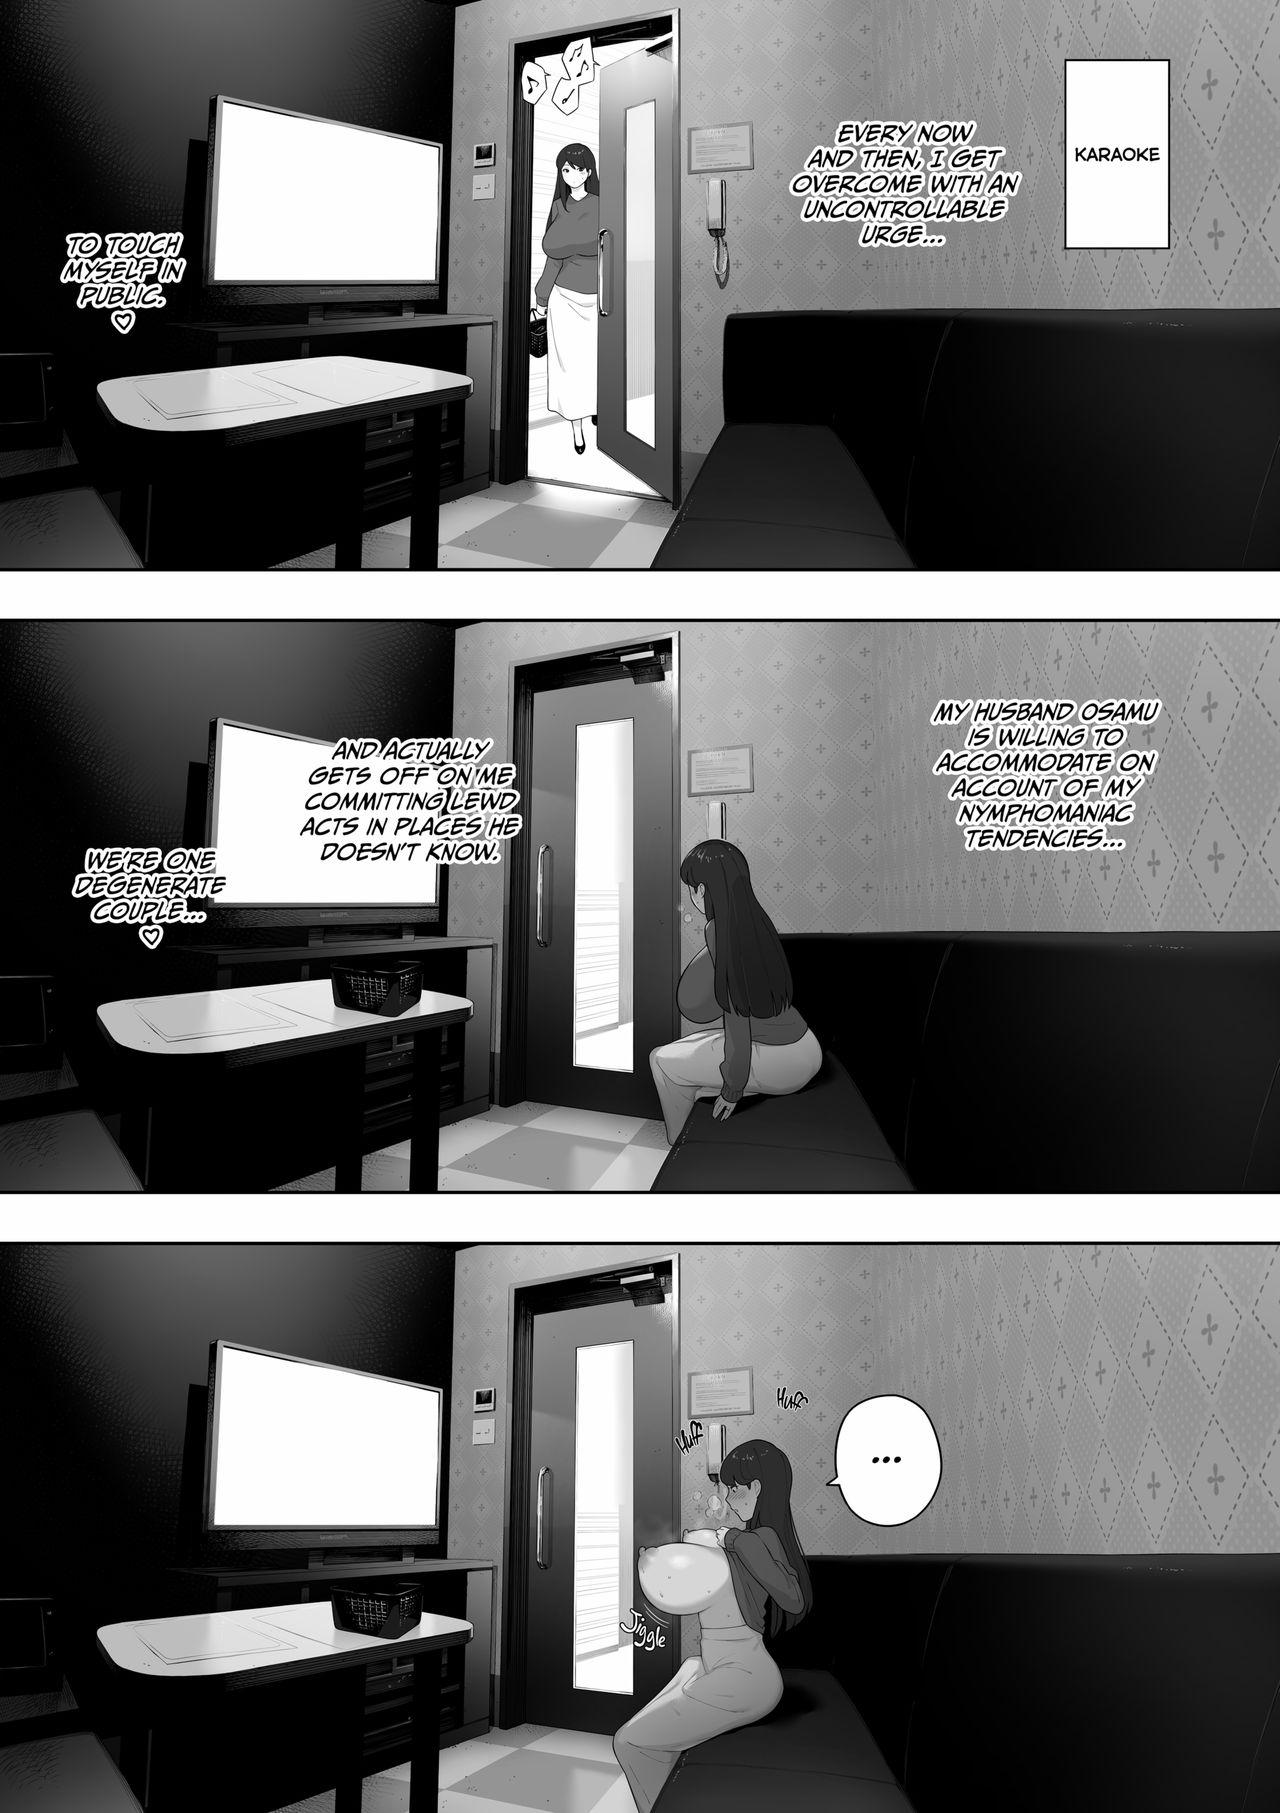 [NT Labo (NT Robo)] Aisai, Doui no Ue, Netorare Roshutsu | [NT Labo(NT Robo)] Cucked With_My Consent My Exhibitionist Wife [English] 4